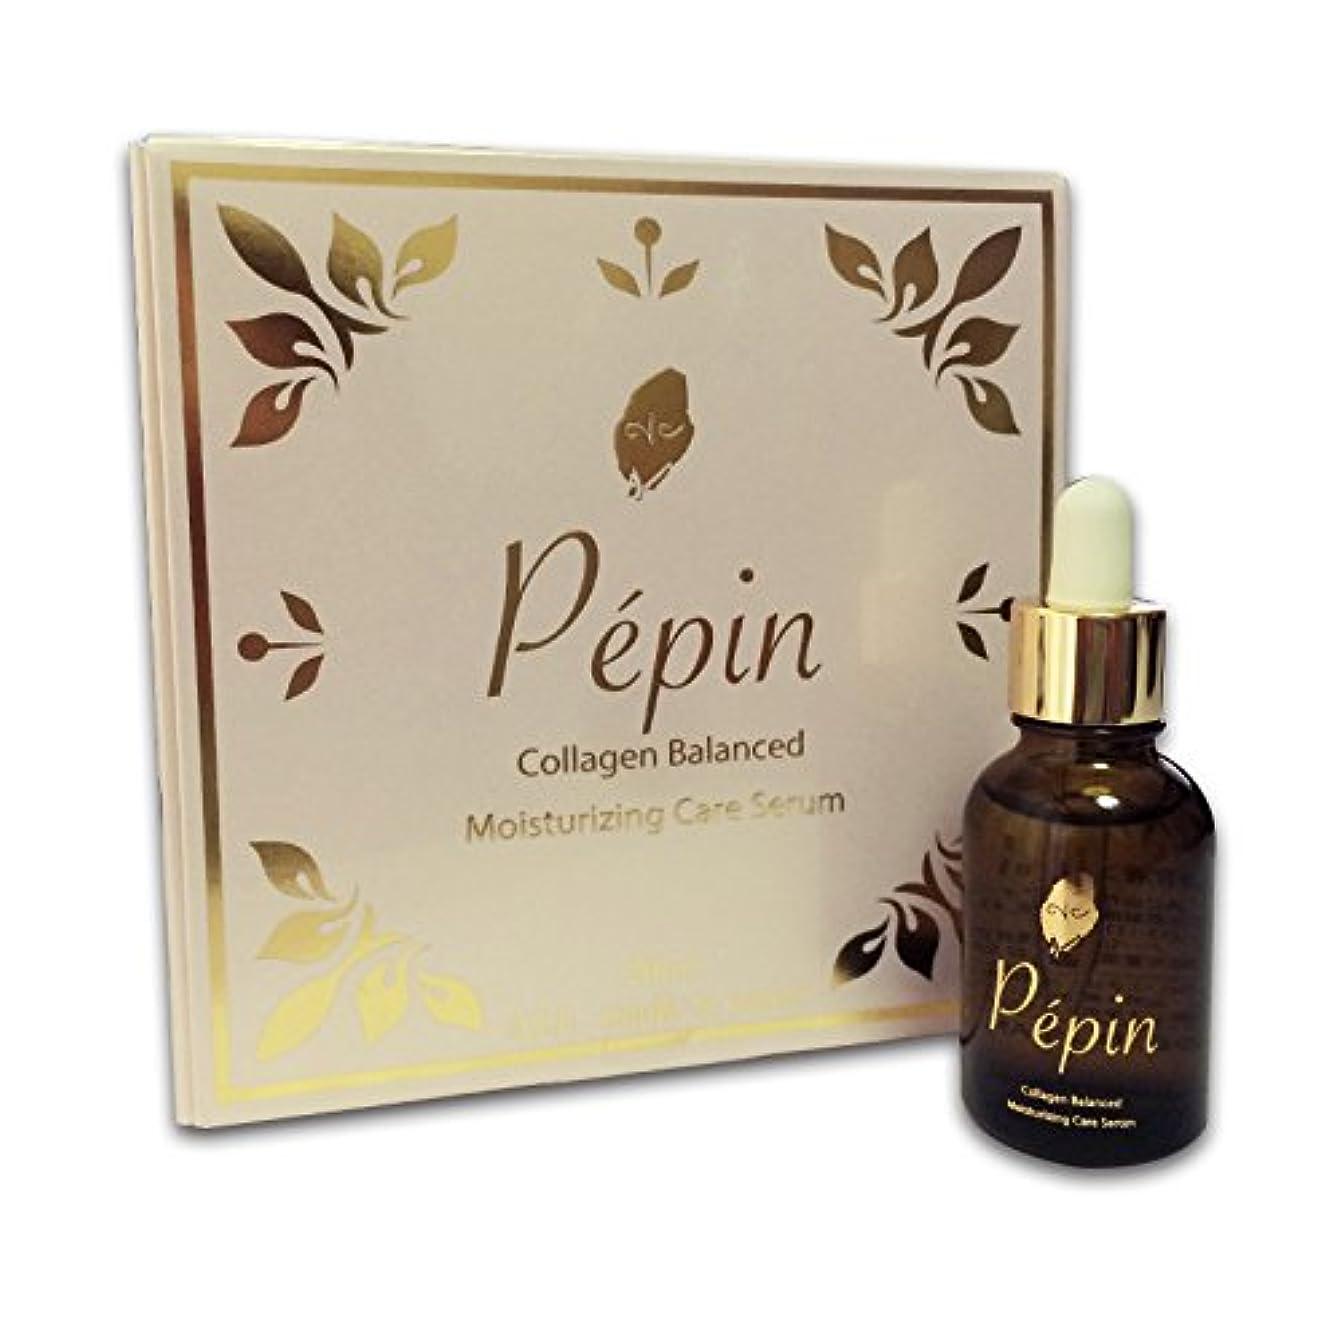 一口ベル涙ヒト幹細胞培養液:超高濃度95%美容液| Pepin(ペパン)20ml|ヒト脂肪細胞順化培養液?ヒト線維芽細胞順化培養液